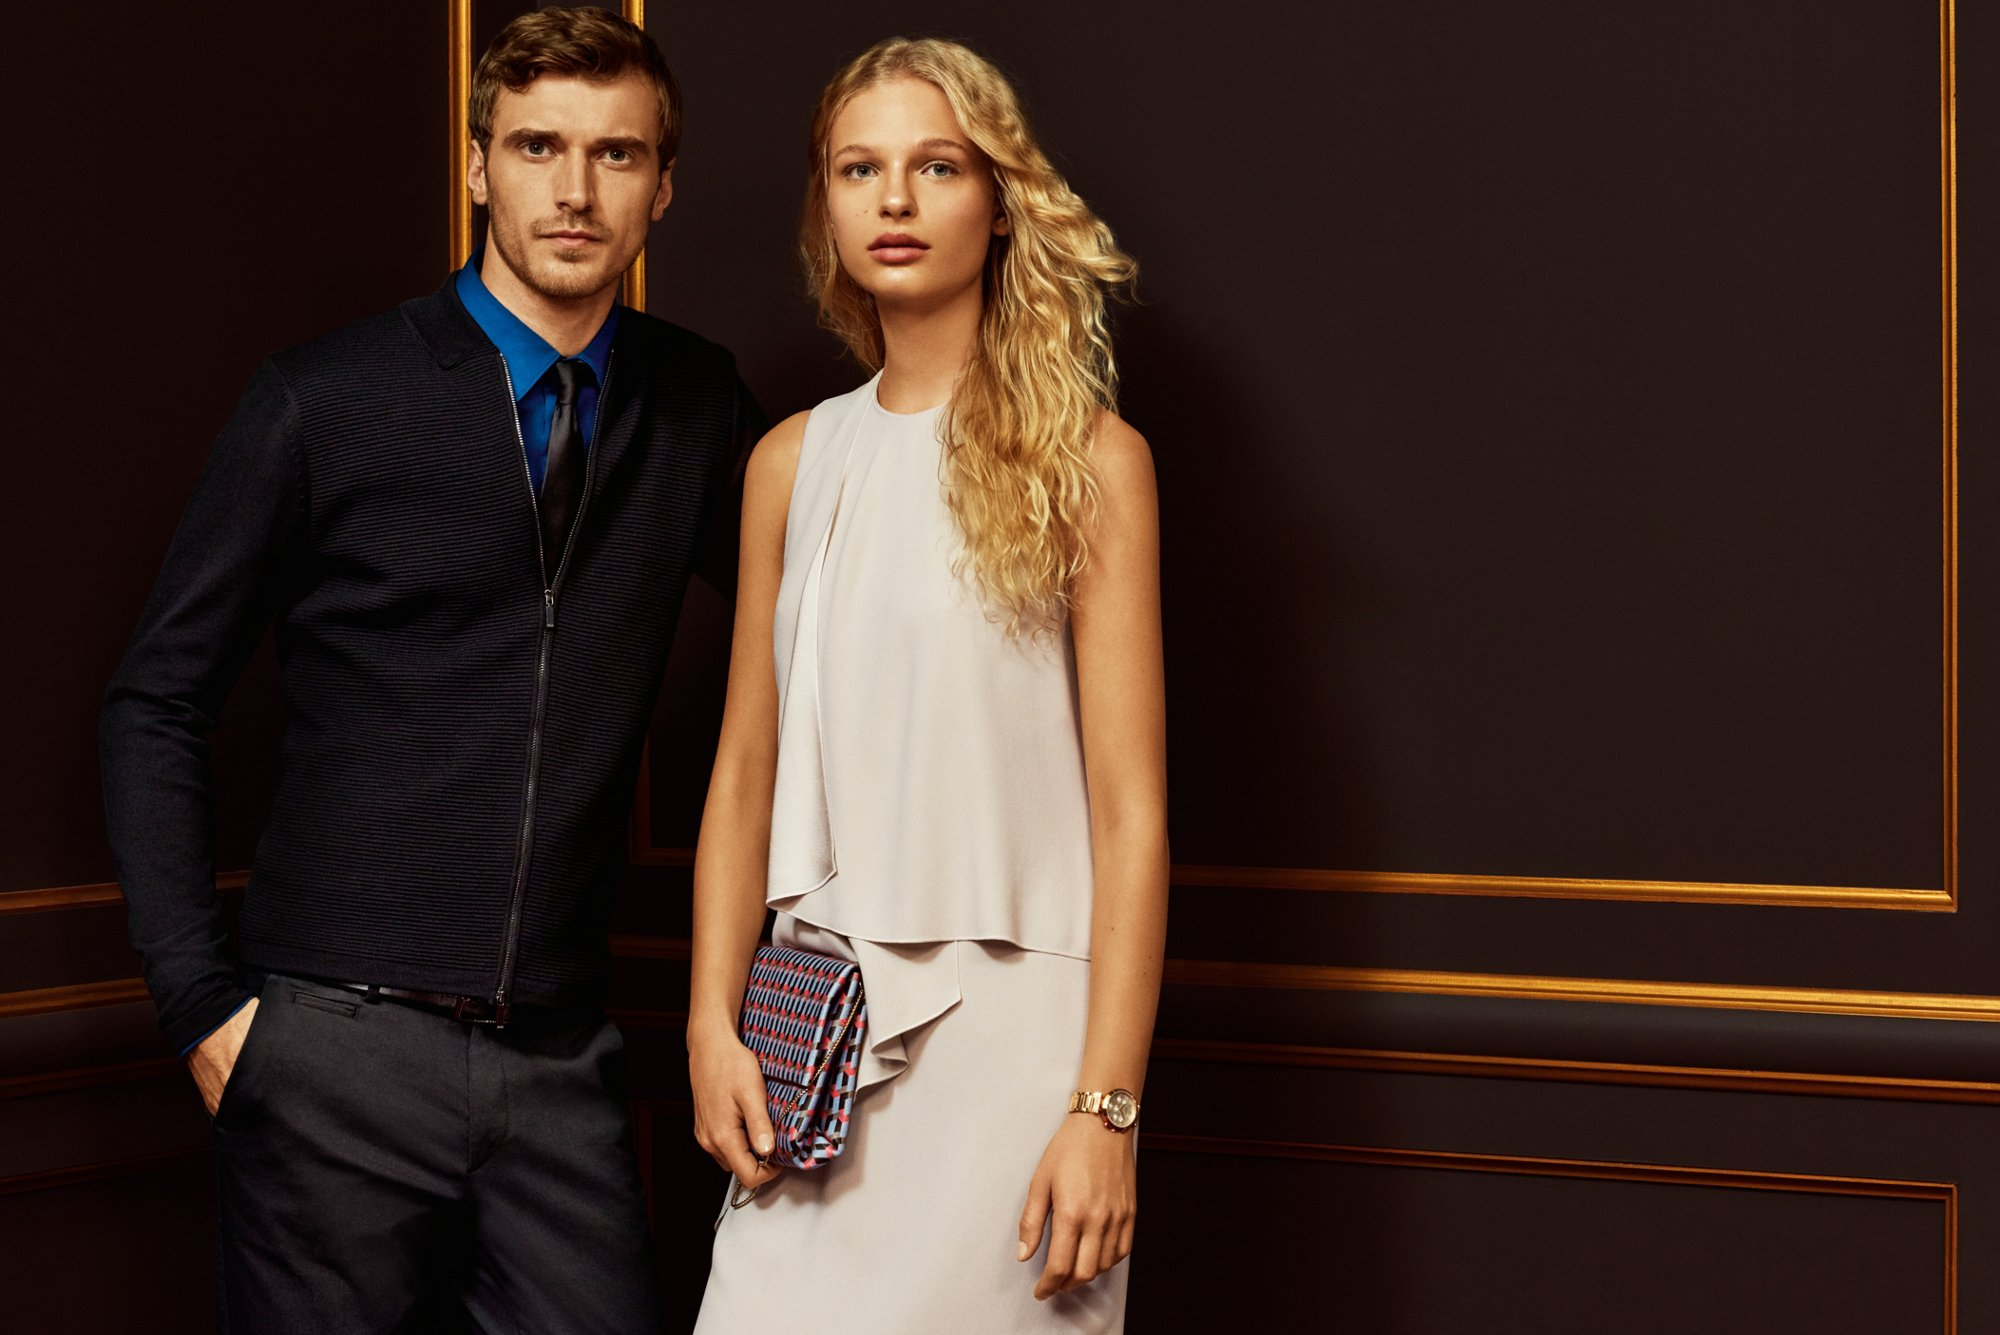 Couple wearing knitwear and dress by BOSS